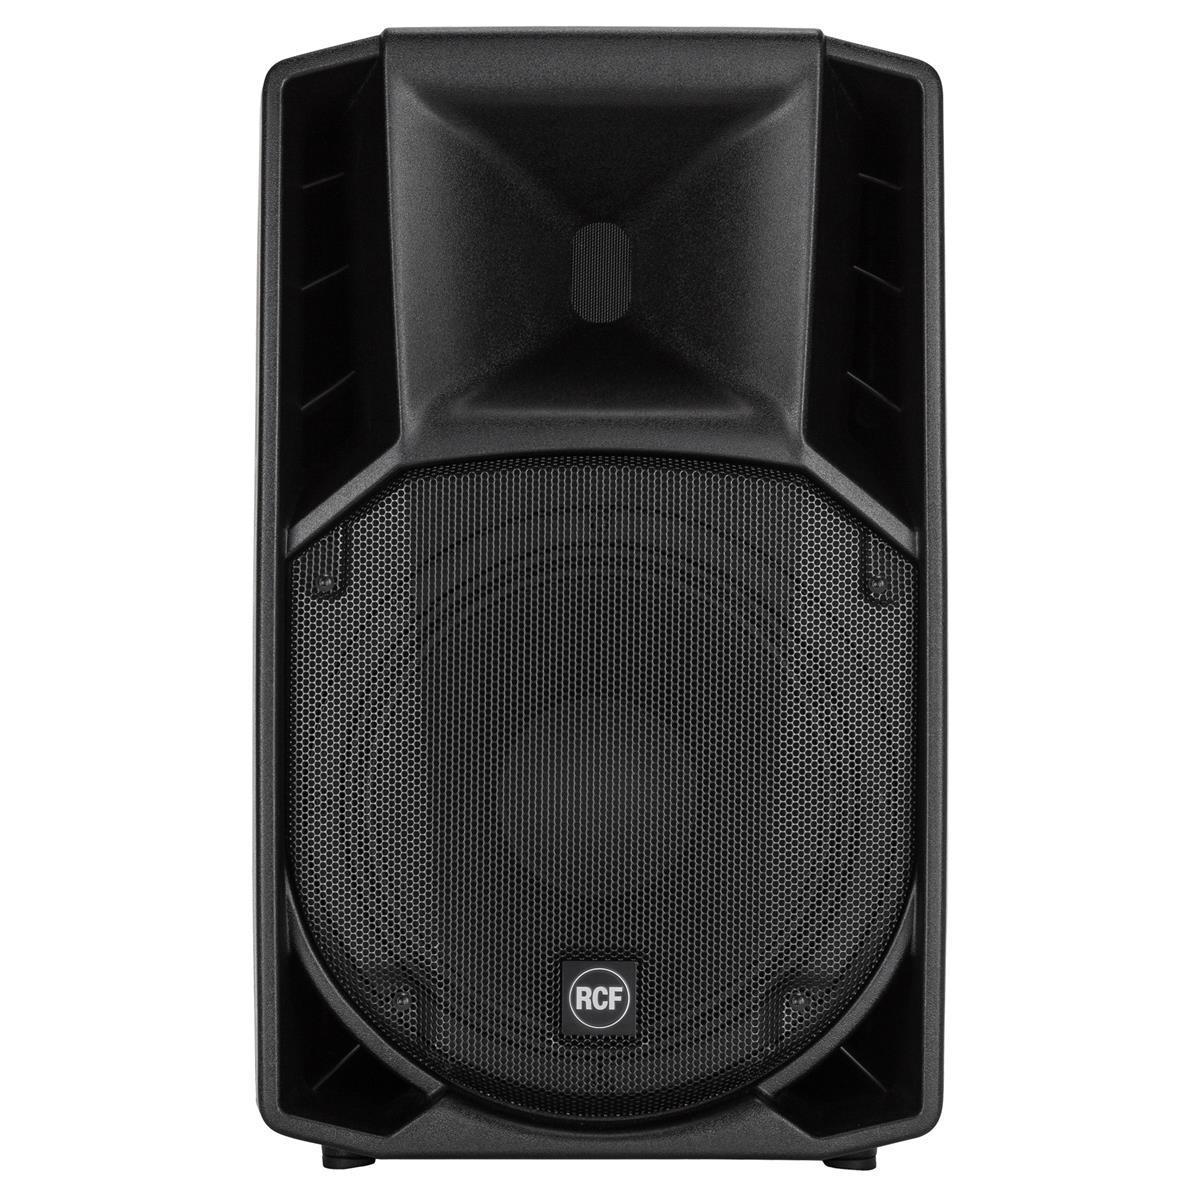 RCF Digital active speaker system 12in + 1in, 700Wrms, 1400W